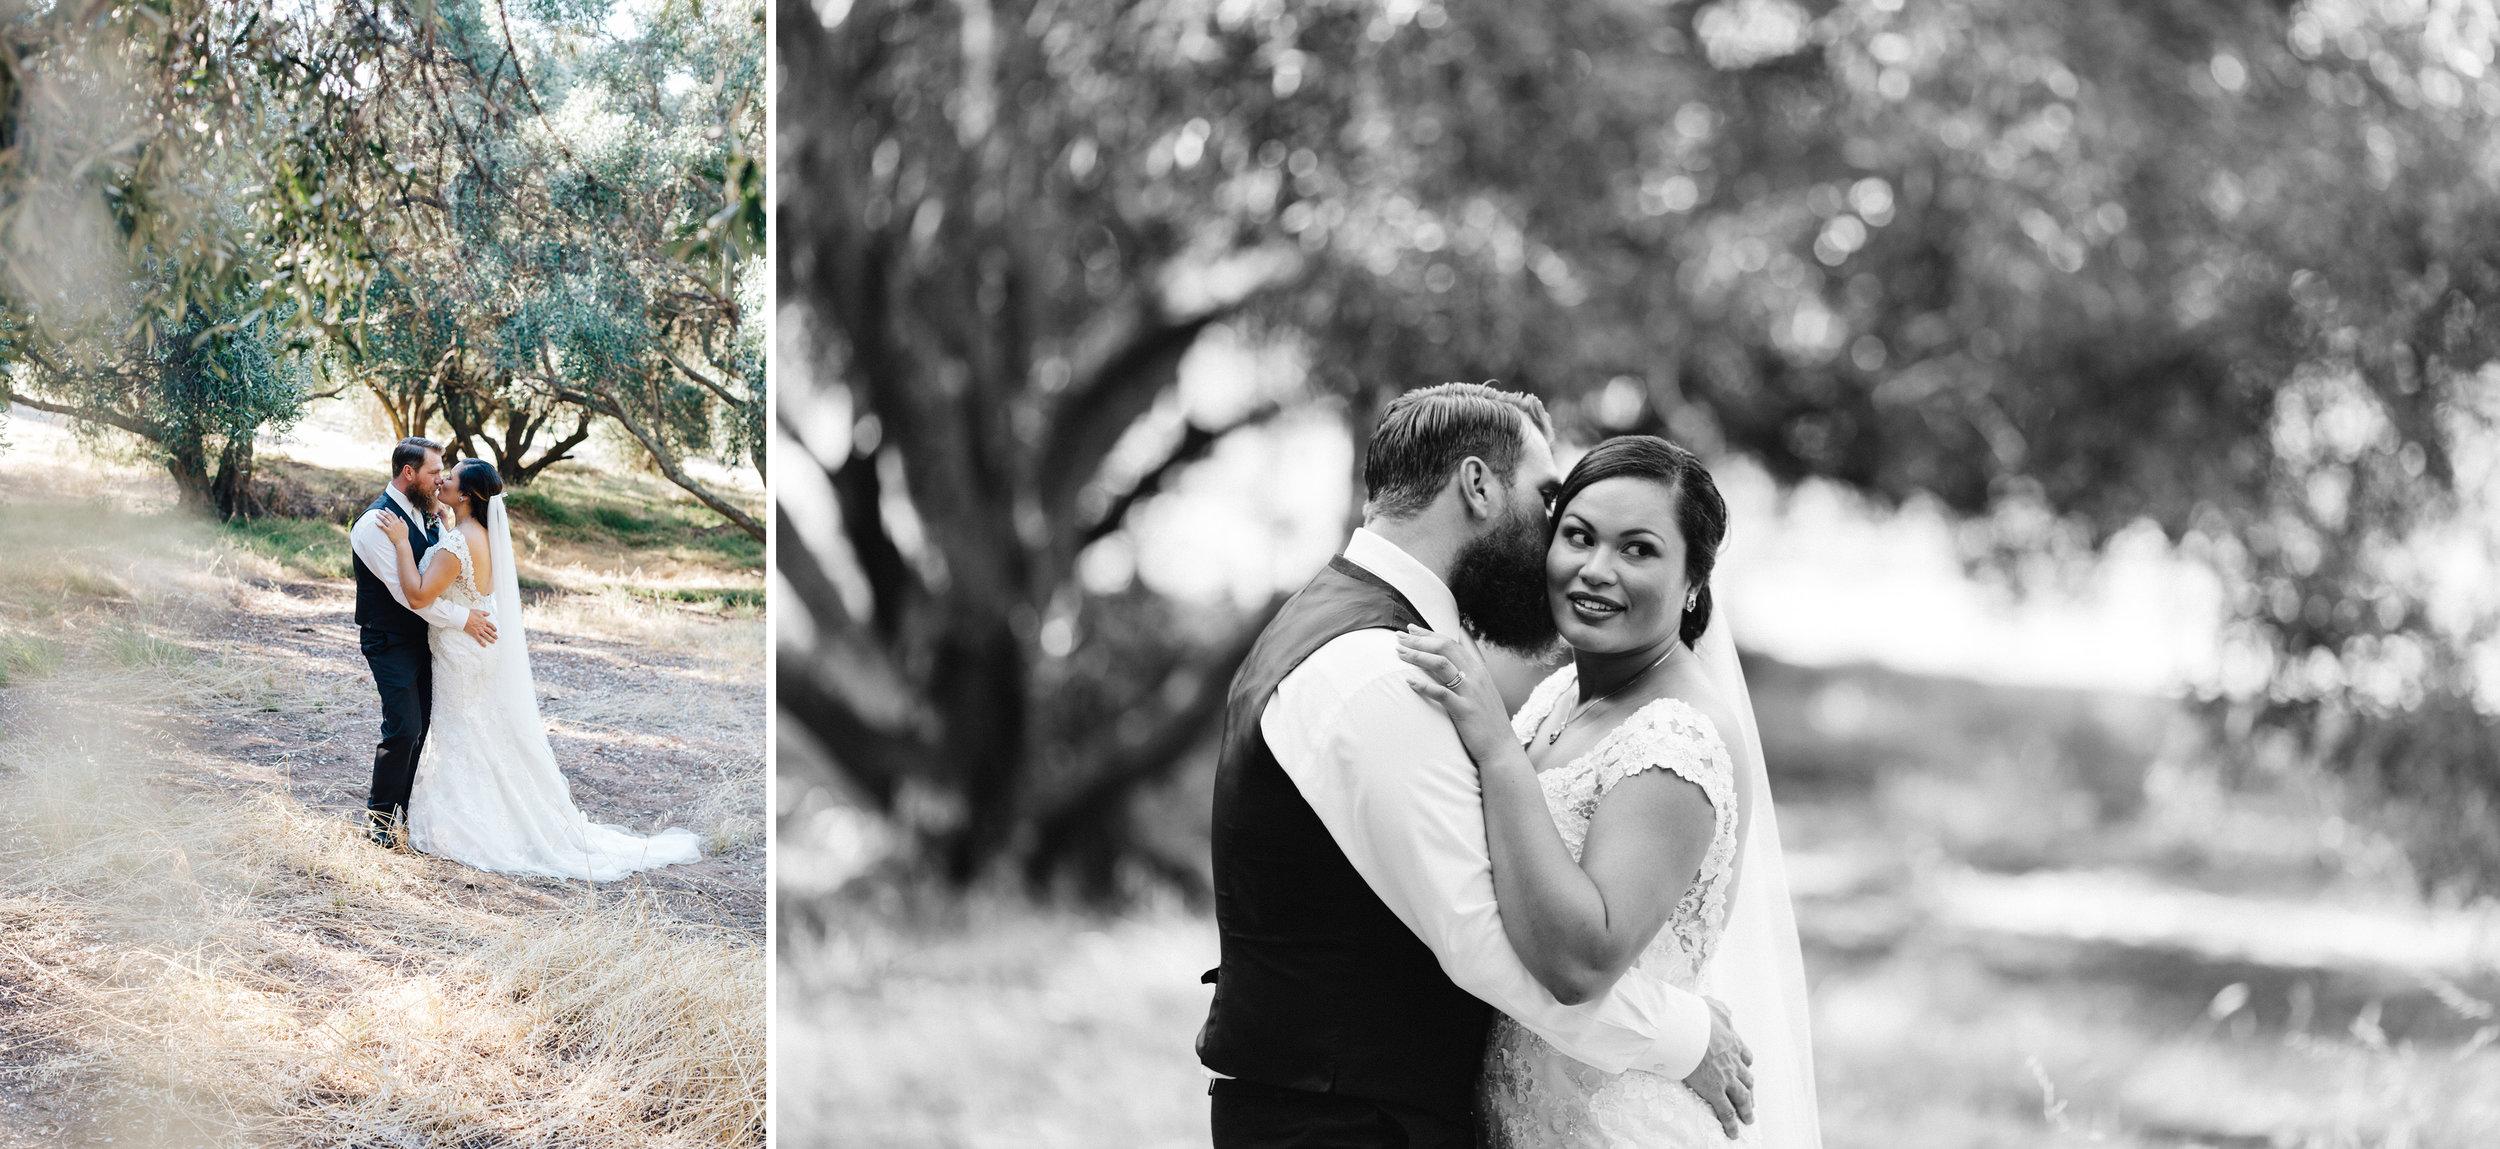 favourite light wedding photography - open shade